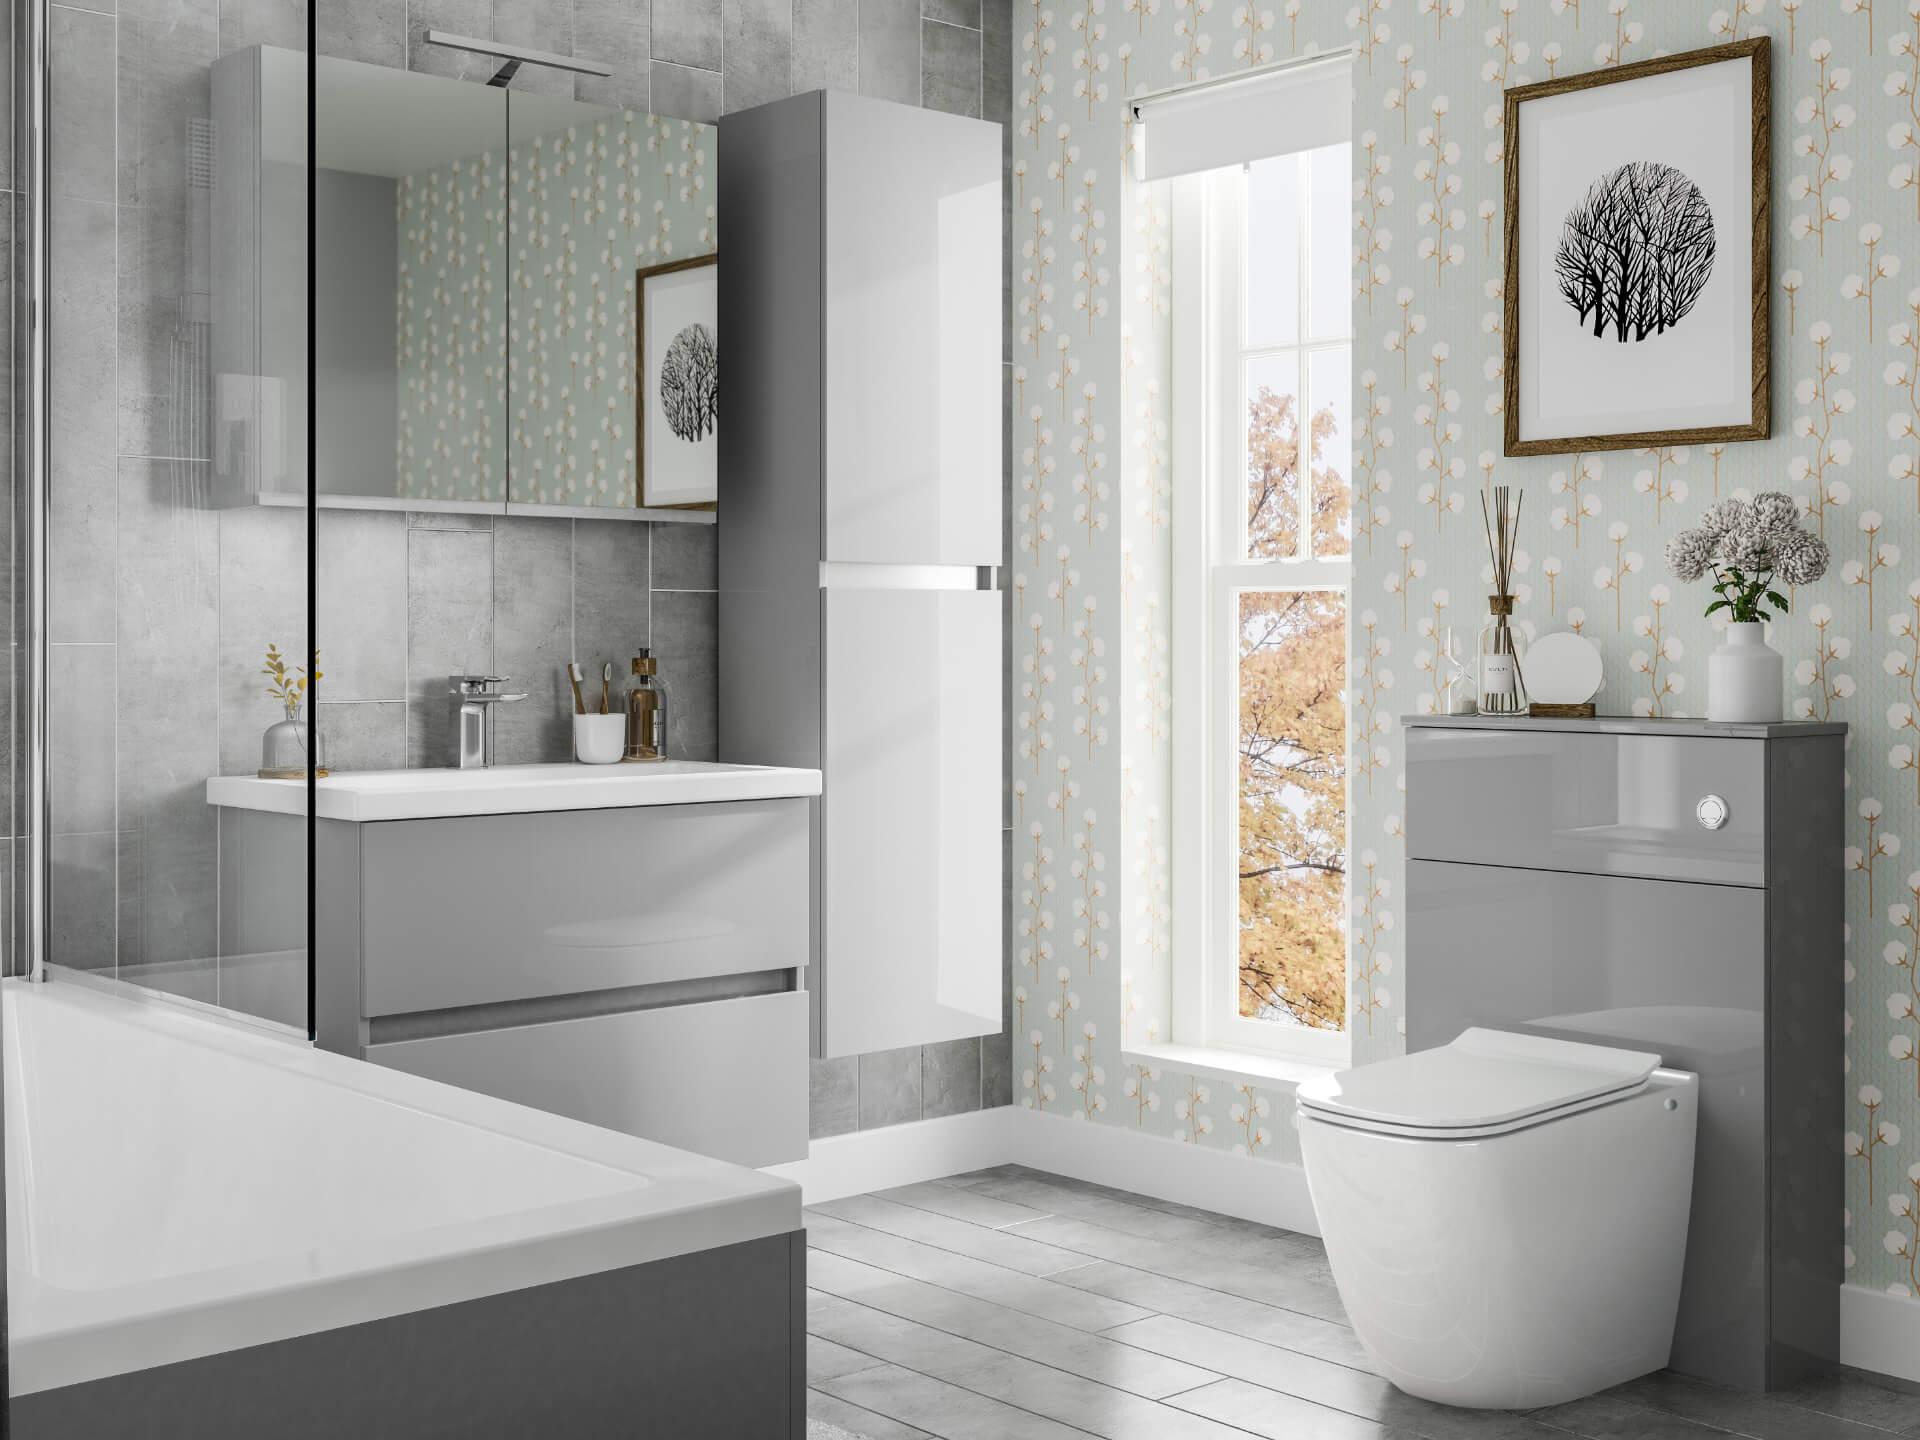 Utopia Bathroom Qube Grey Bathroom